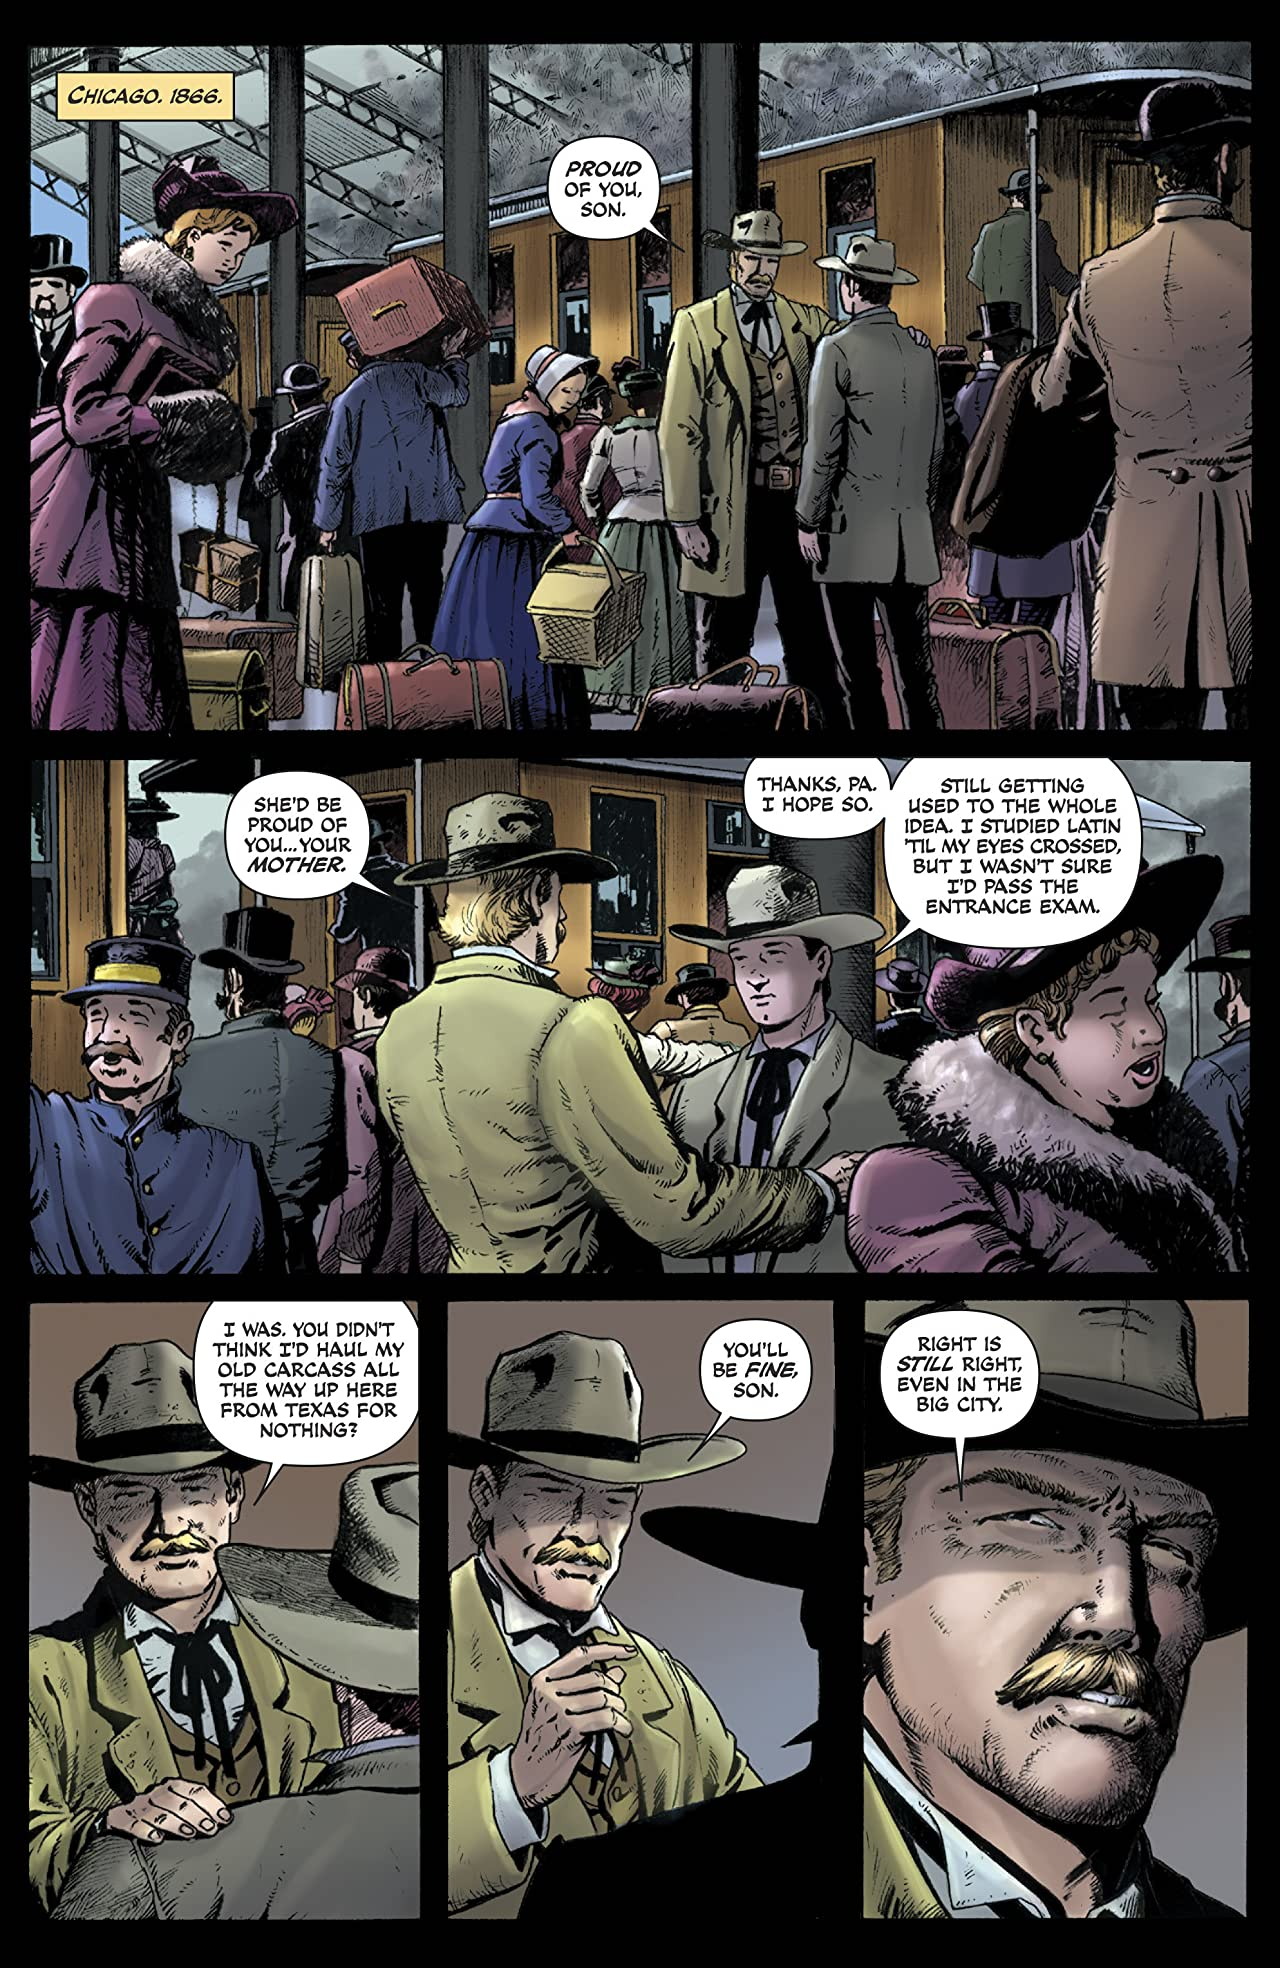 The Lone Ranger Vol. 2 #16